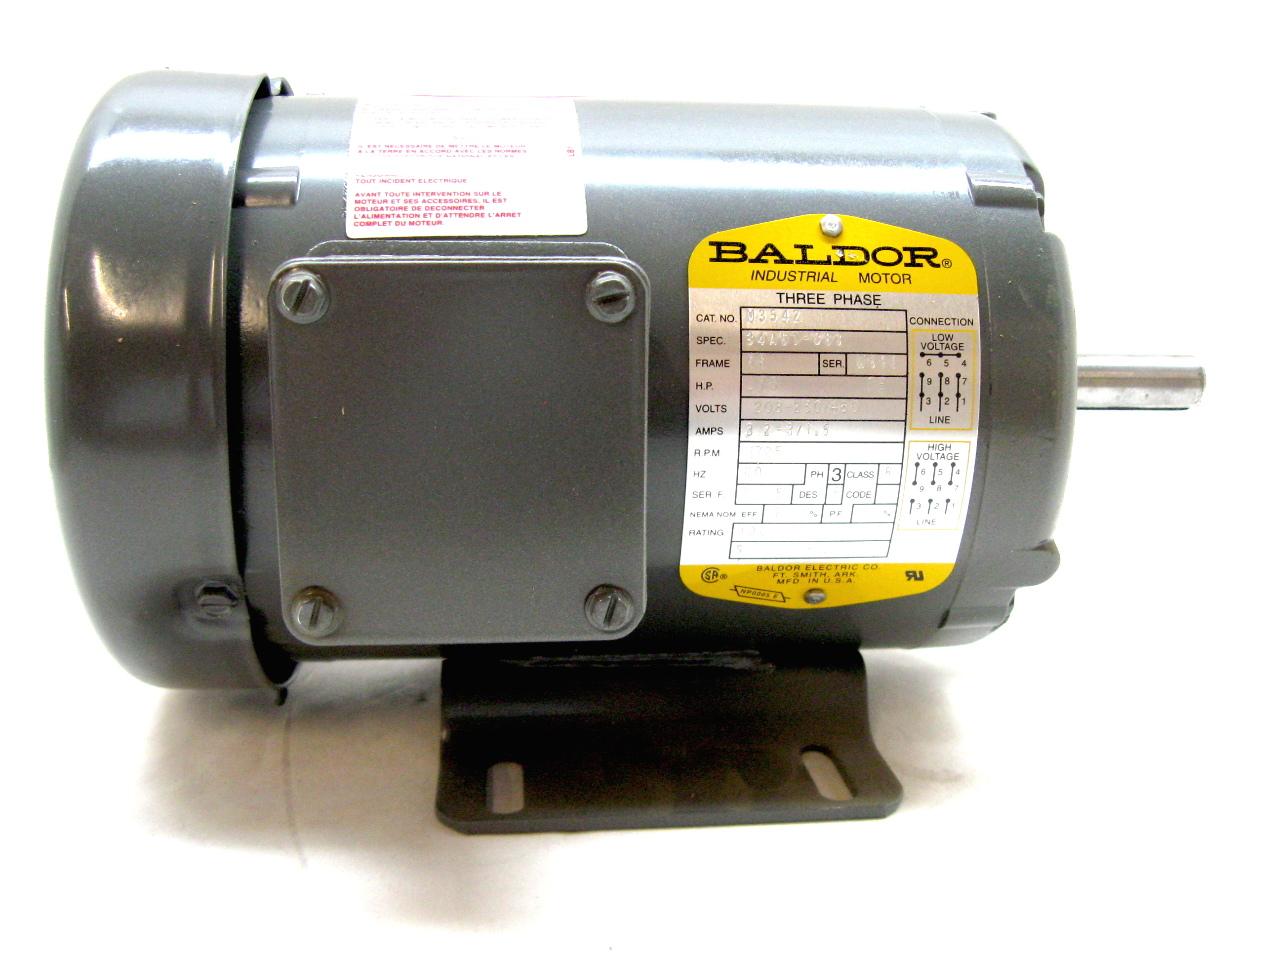 ip5273 baldor m3542 three phase enclosed motor 75 hp 1725 rpm 208 230 460v new 3?resize\\\=665%2C499 baldor generator wiring diagram becker wiring diagram \u2022 couponss co  at downloadfilm.co